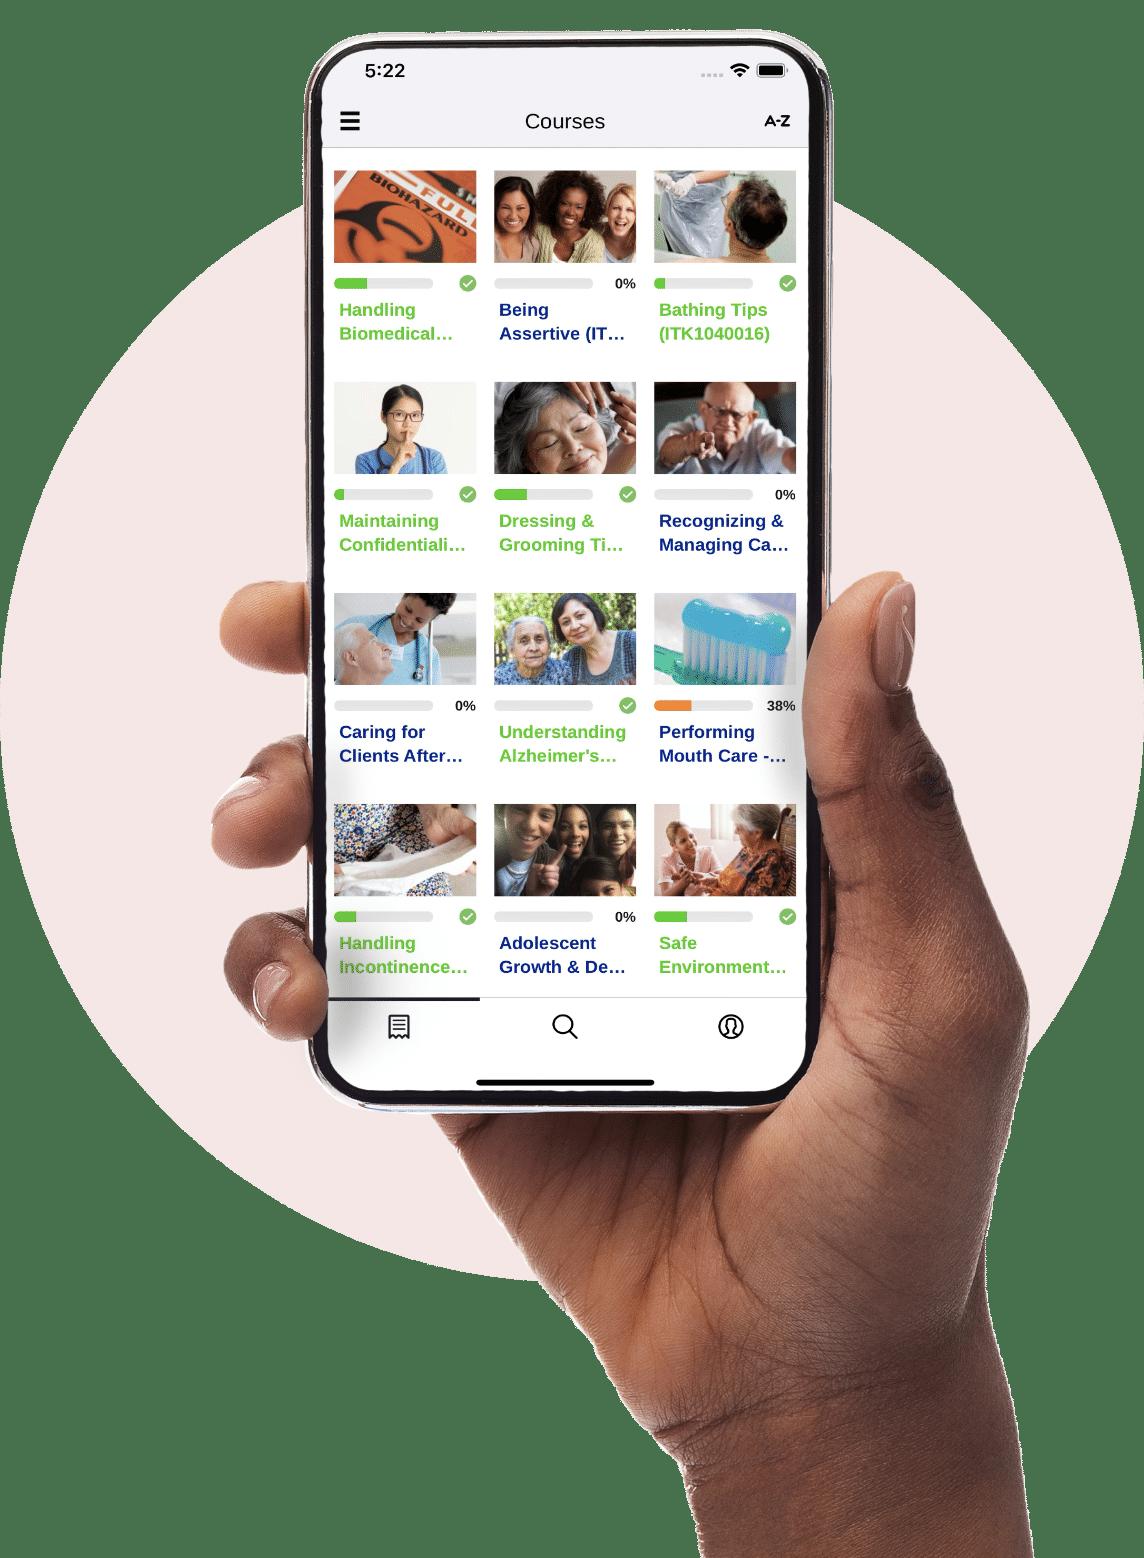 Mobile online caregiver training app